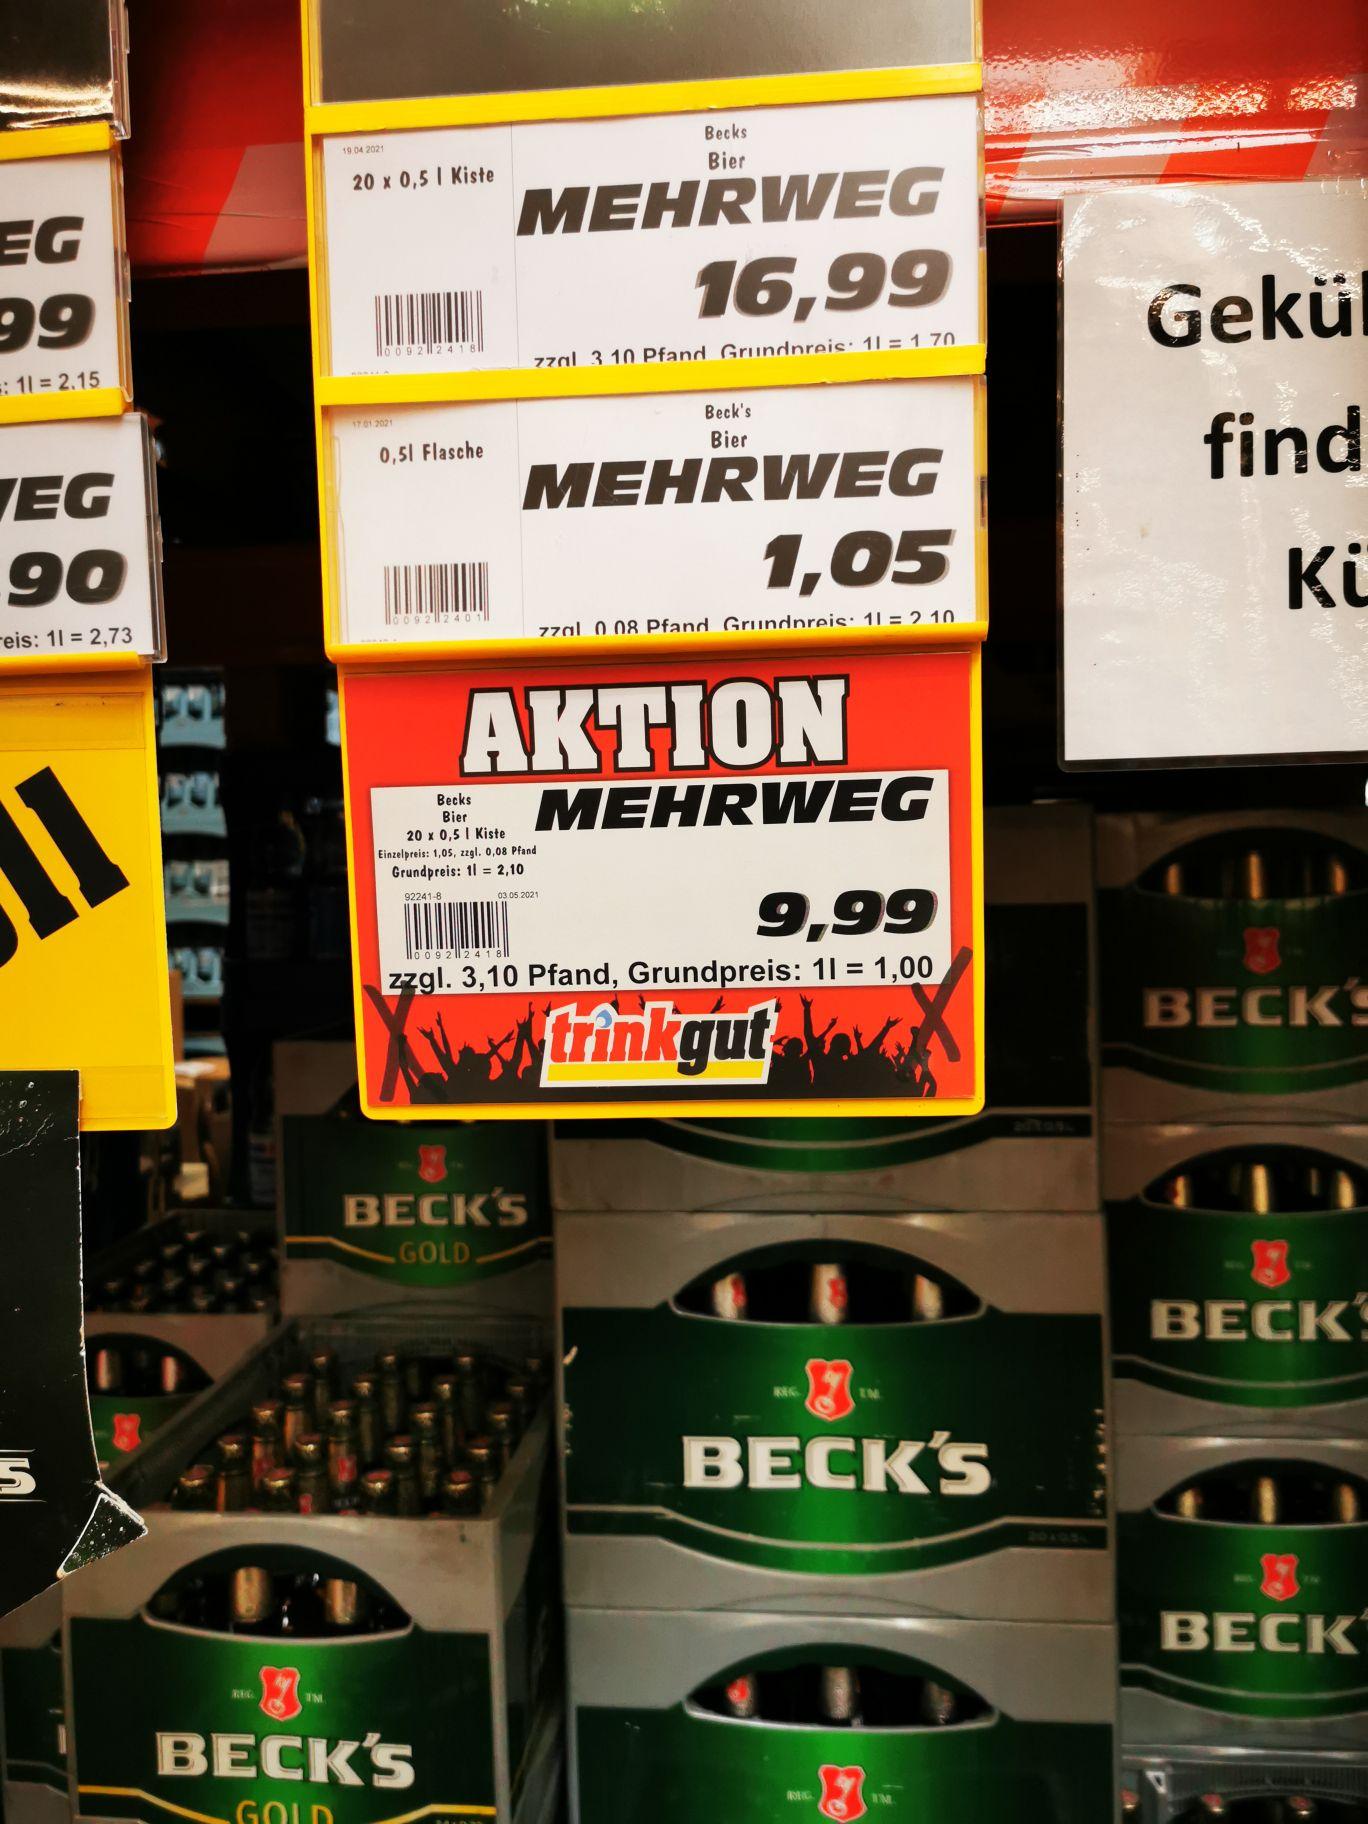 Becks Pils 0,5 Liter Kasten Lokal Düsseldorf Reisholz Trinkgut